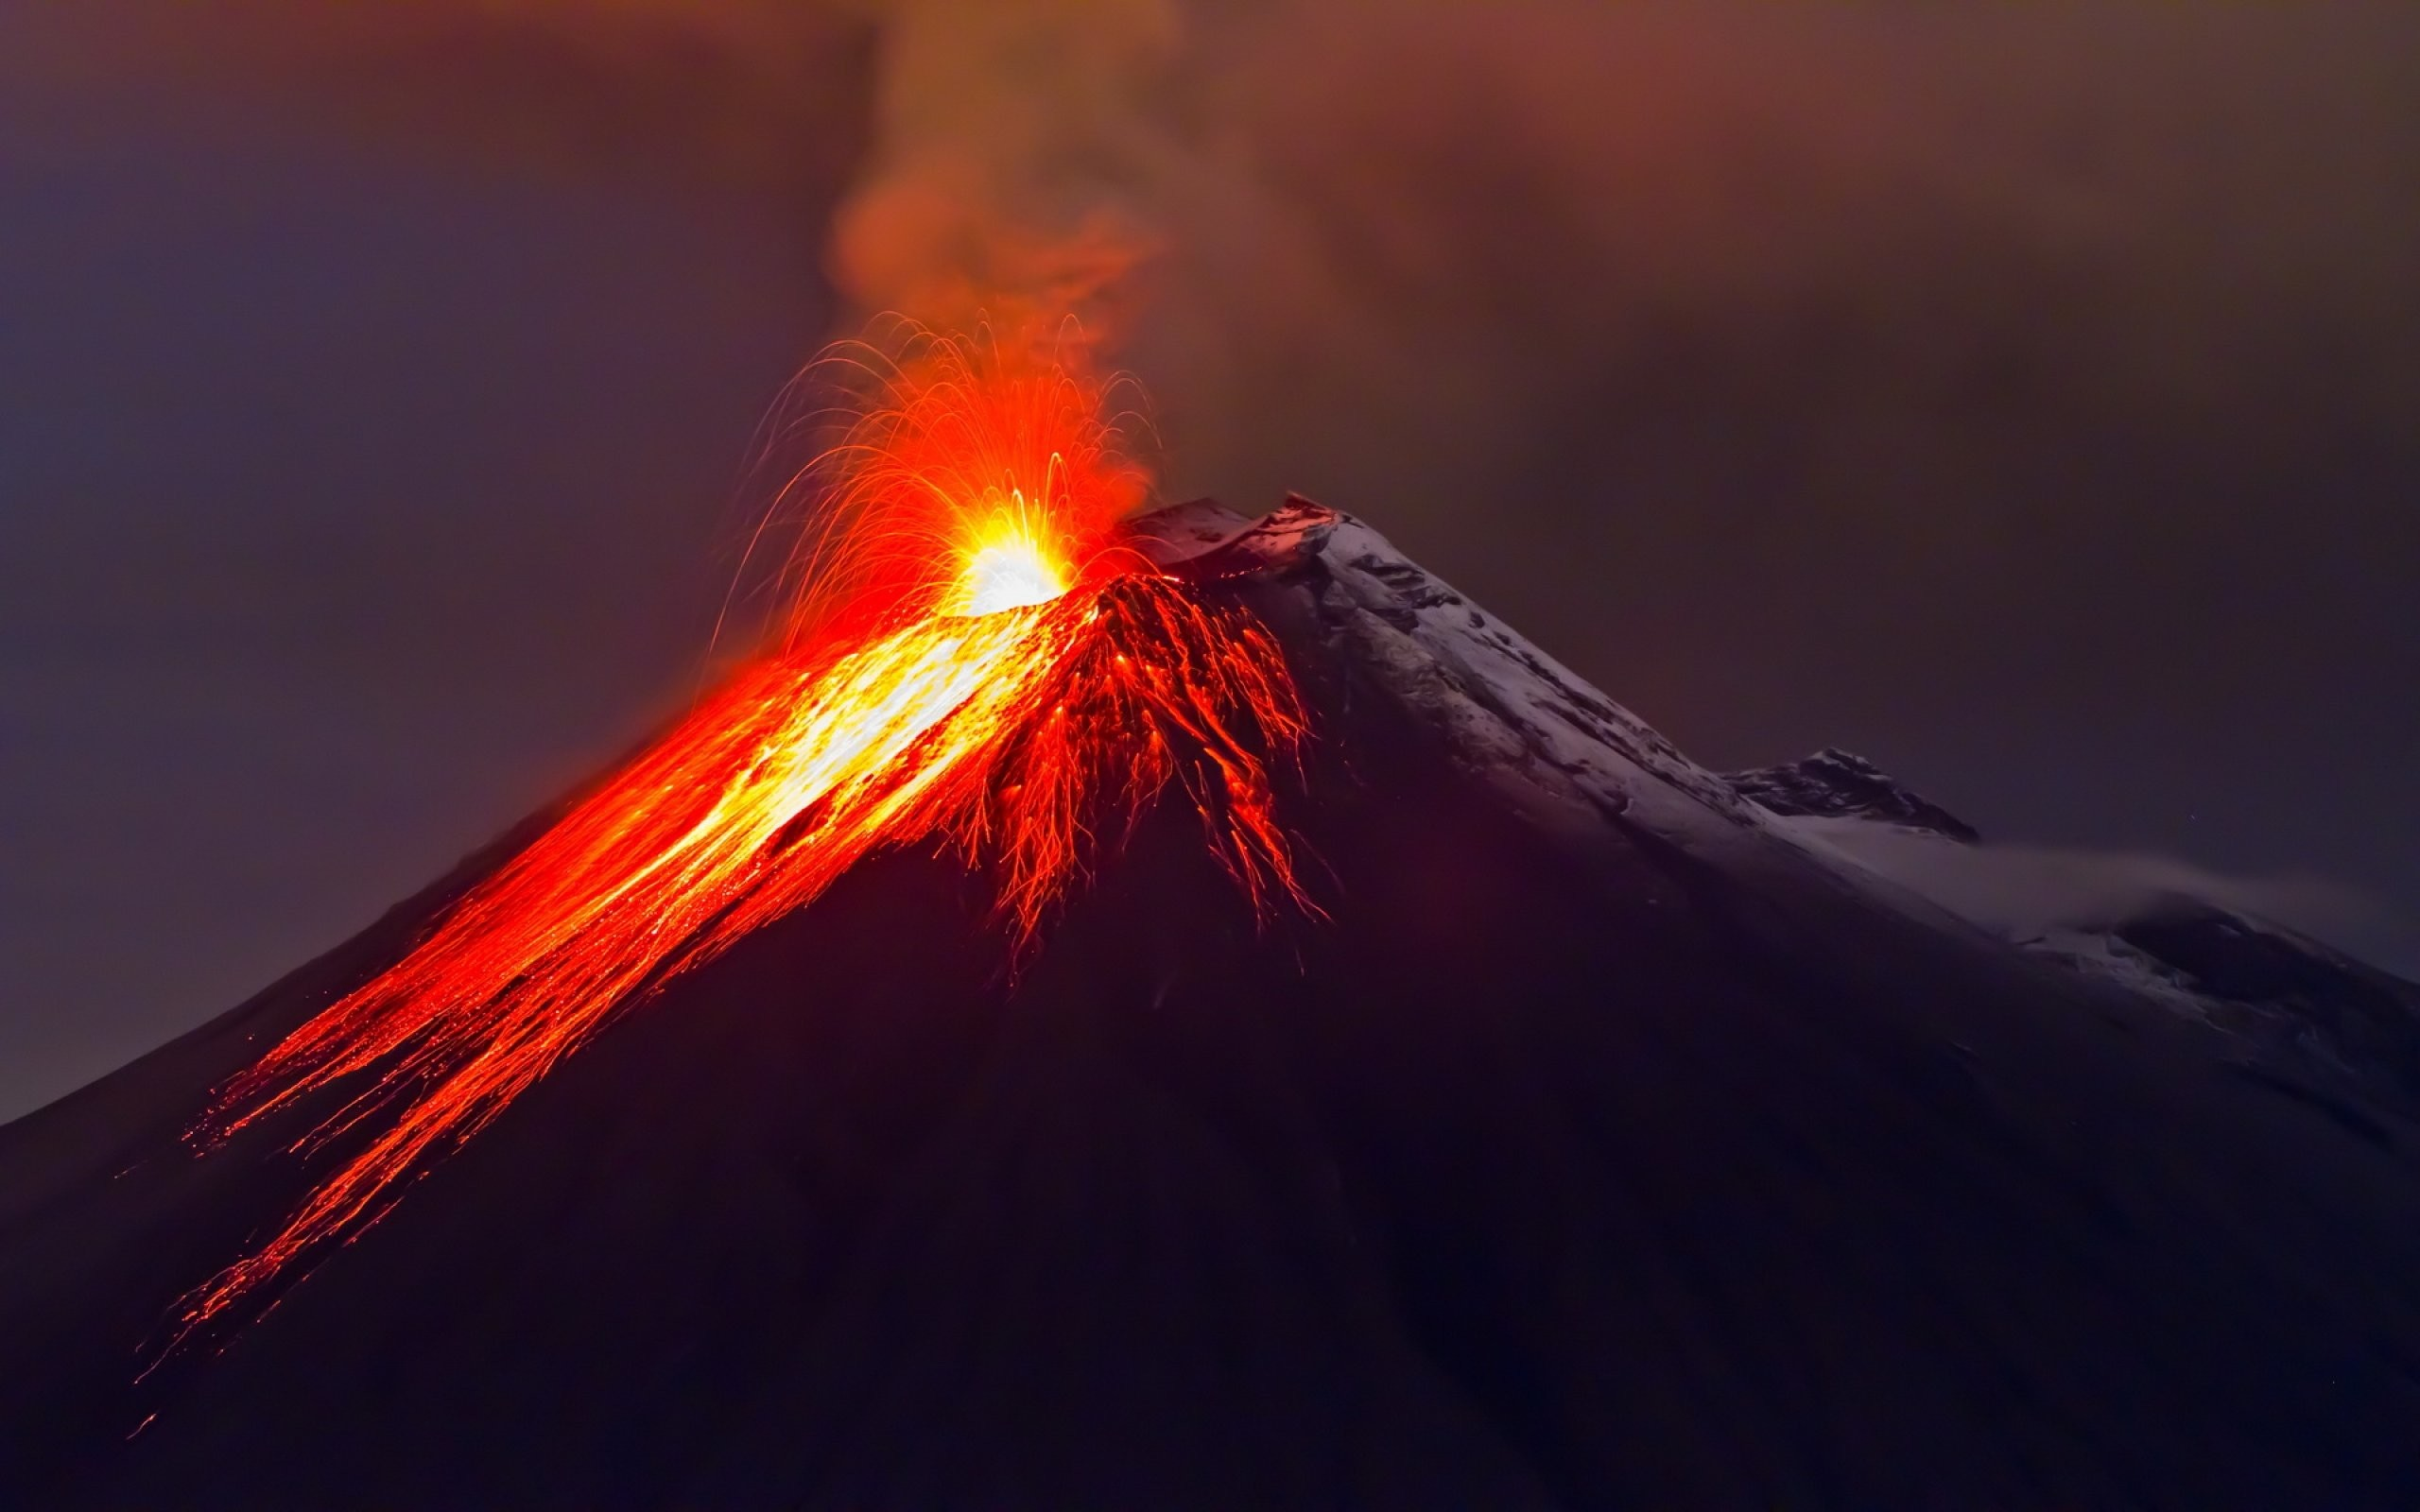 Volcano Eruption Lightning HD desktop wallpaper High Definition